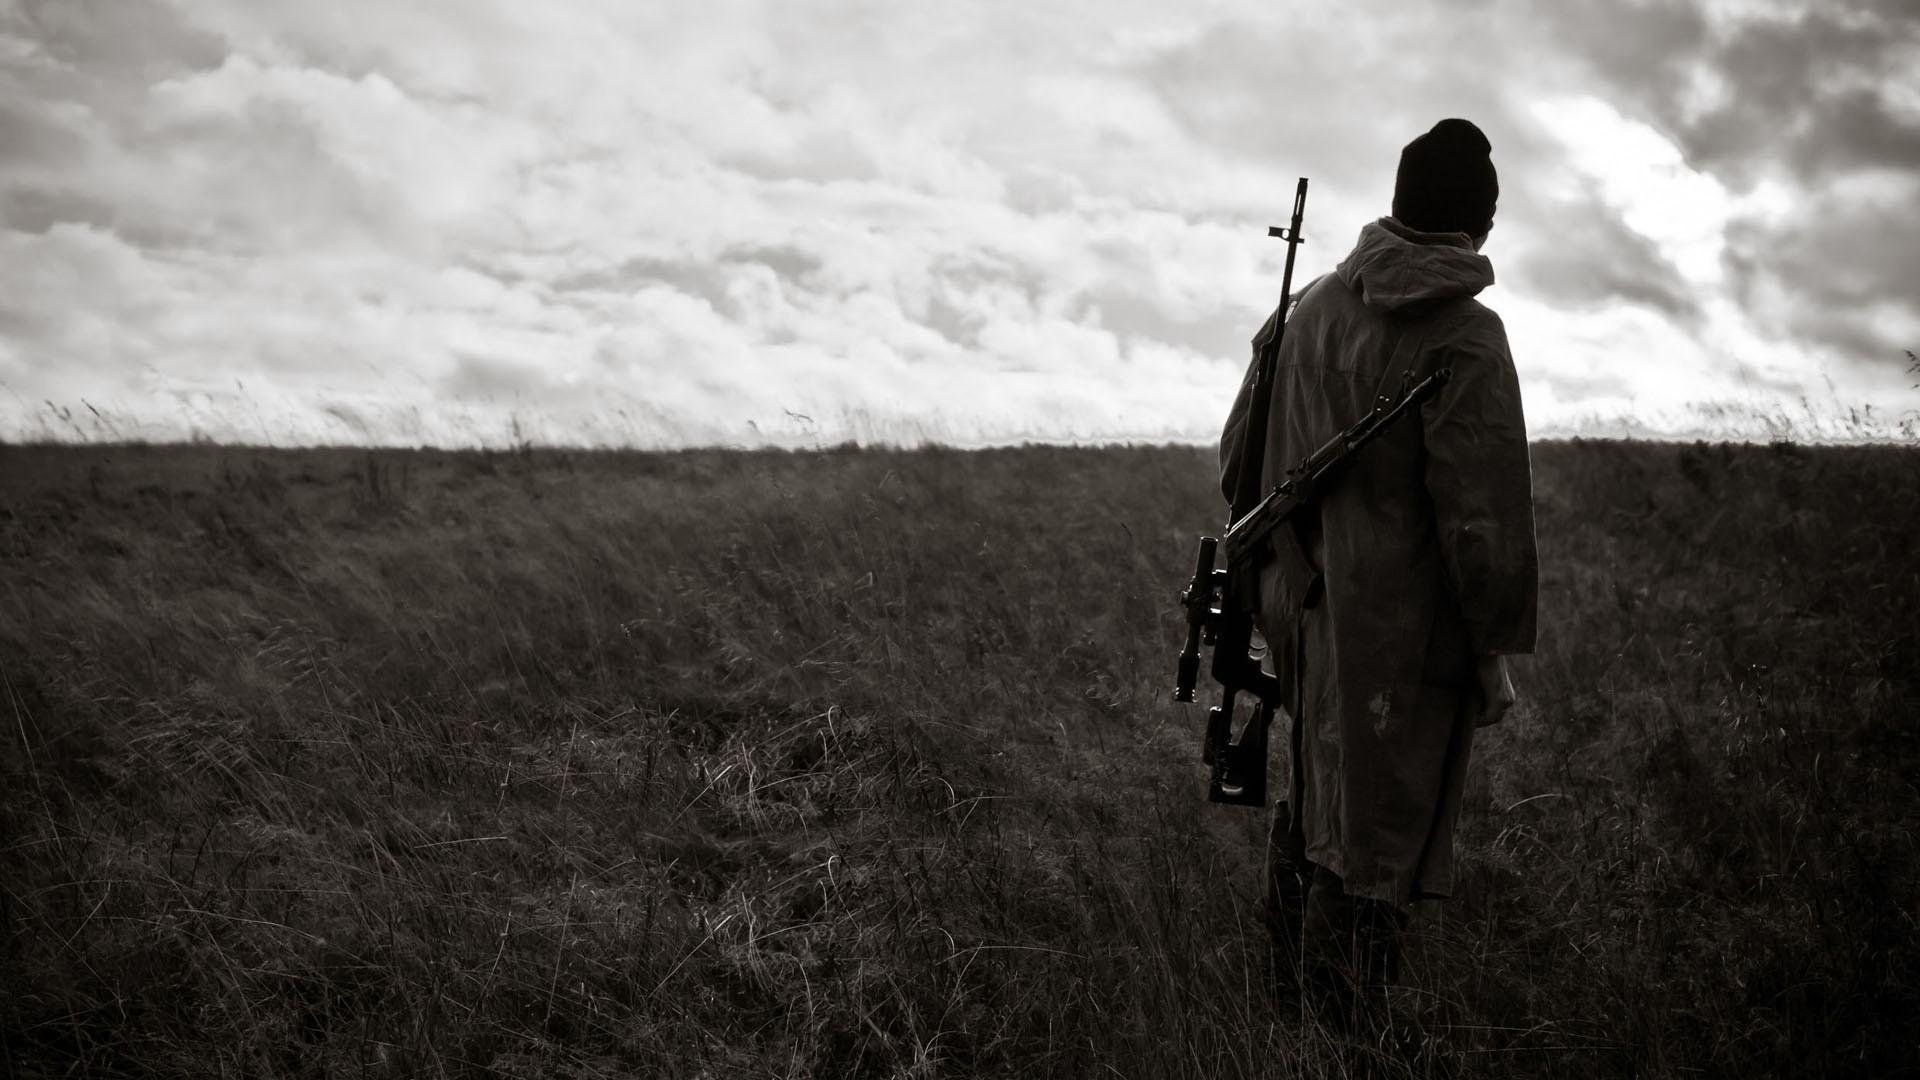 Sniper Rifle Target Dragunov AK 74 Sky Saw Everything